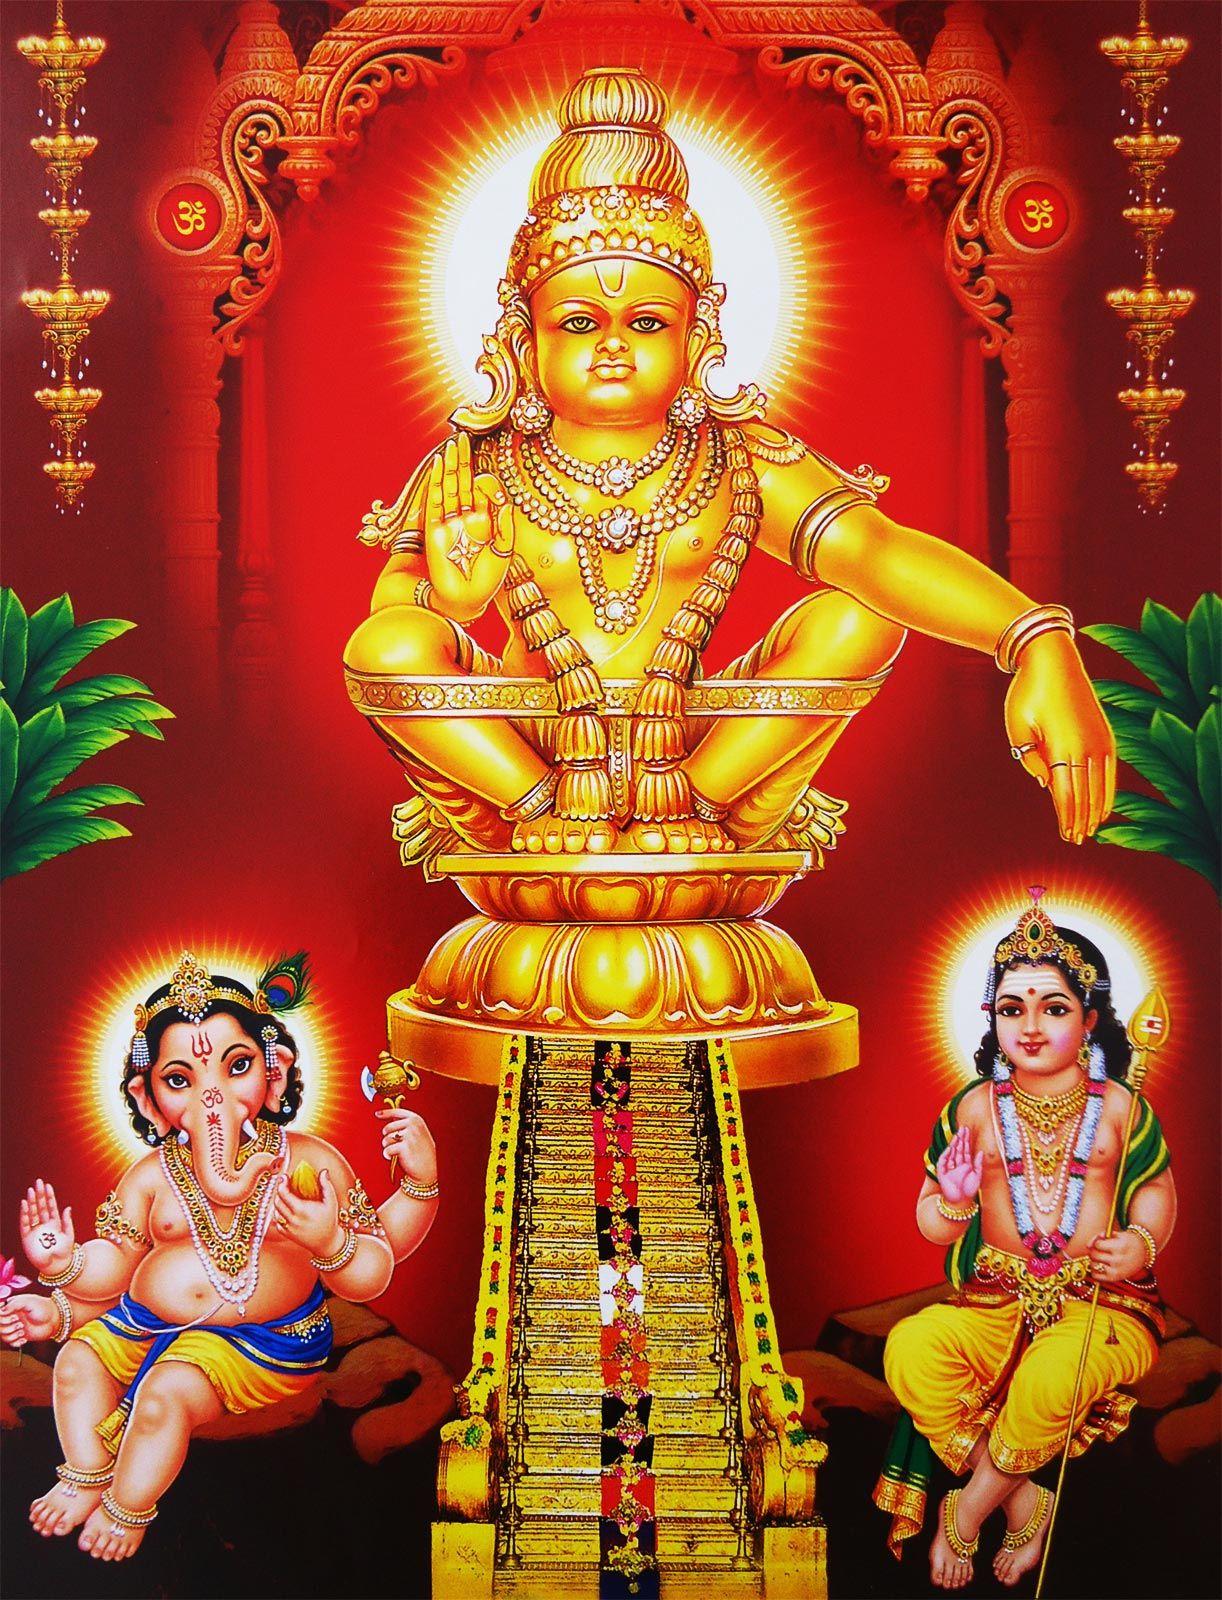 Lord Ganesha Paintings Lord Murugan Wallpapers Lord Shiva Hd Images Hd 1080p ayyappa swamy hd images png